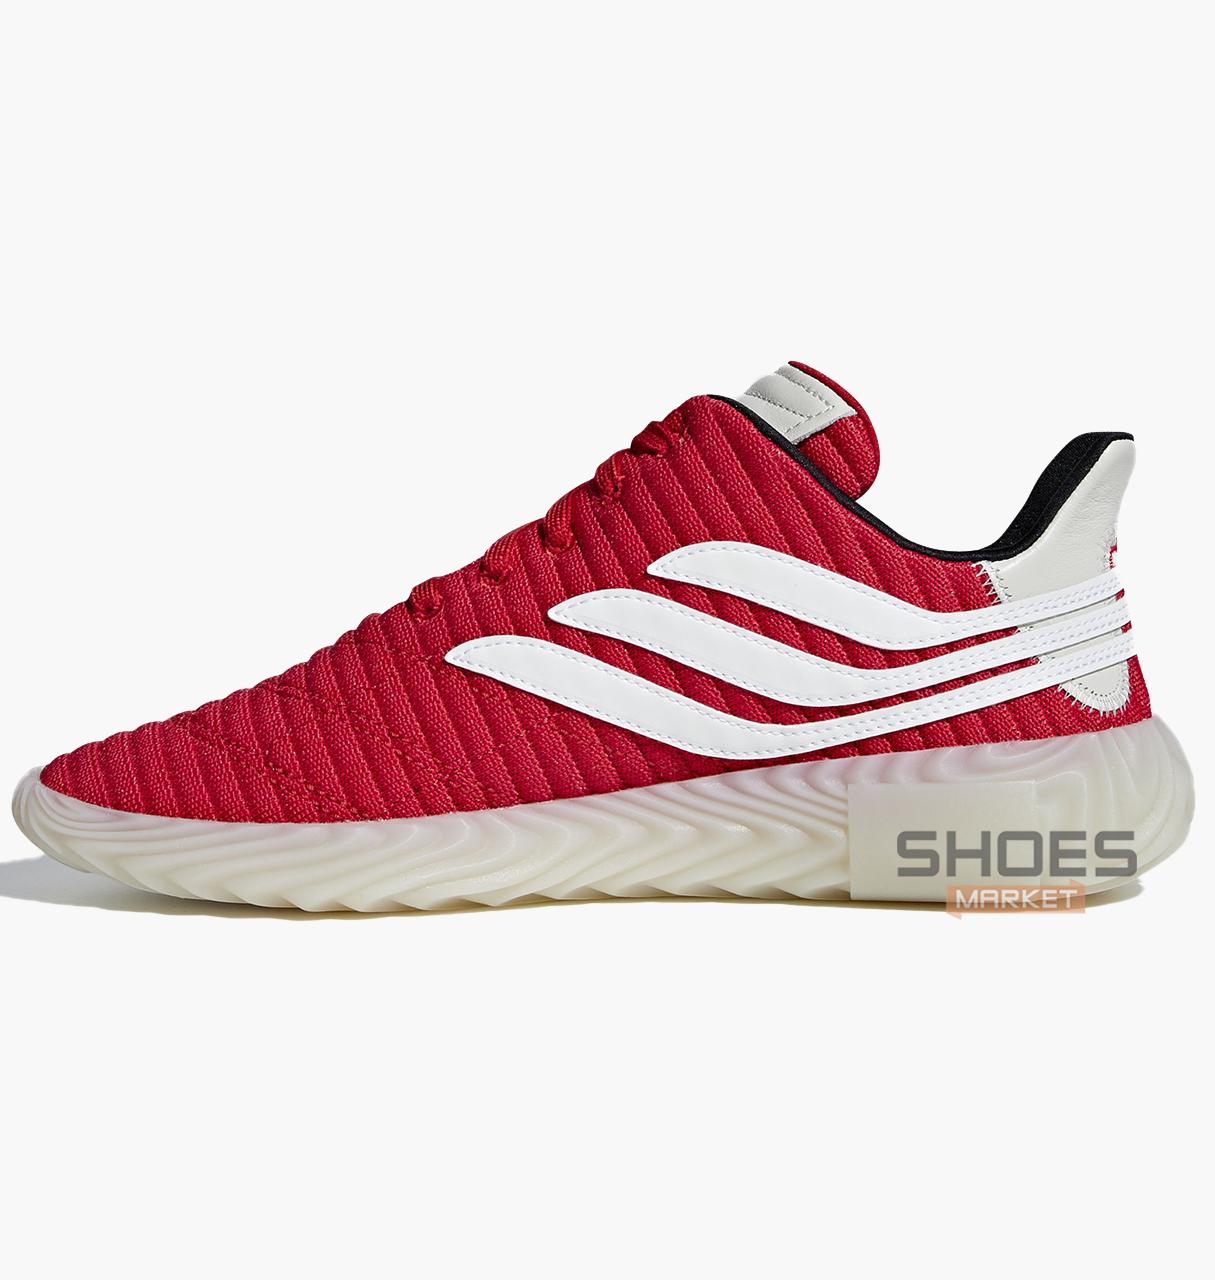 Мужские кроссовки Adidas Sobakov Shoes Red BD7572 b8c0cdaa77ce7